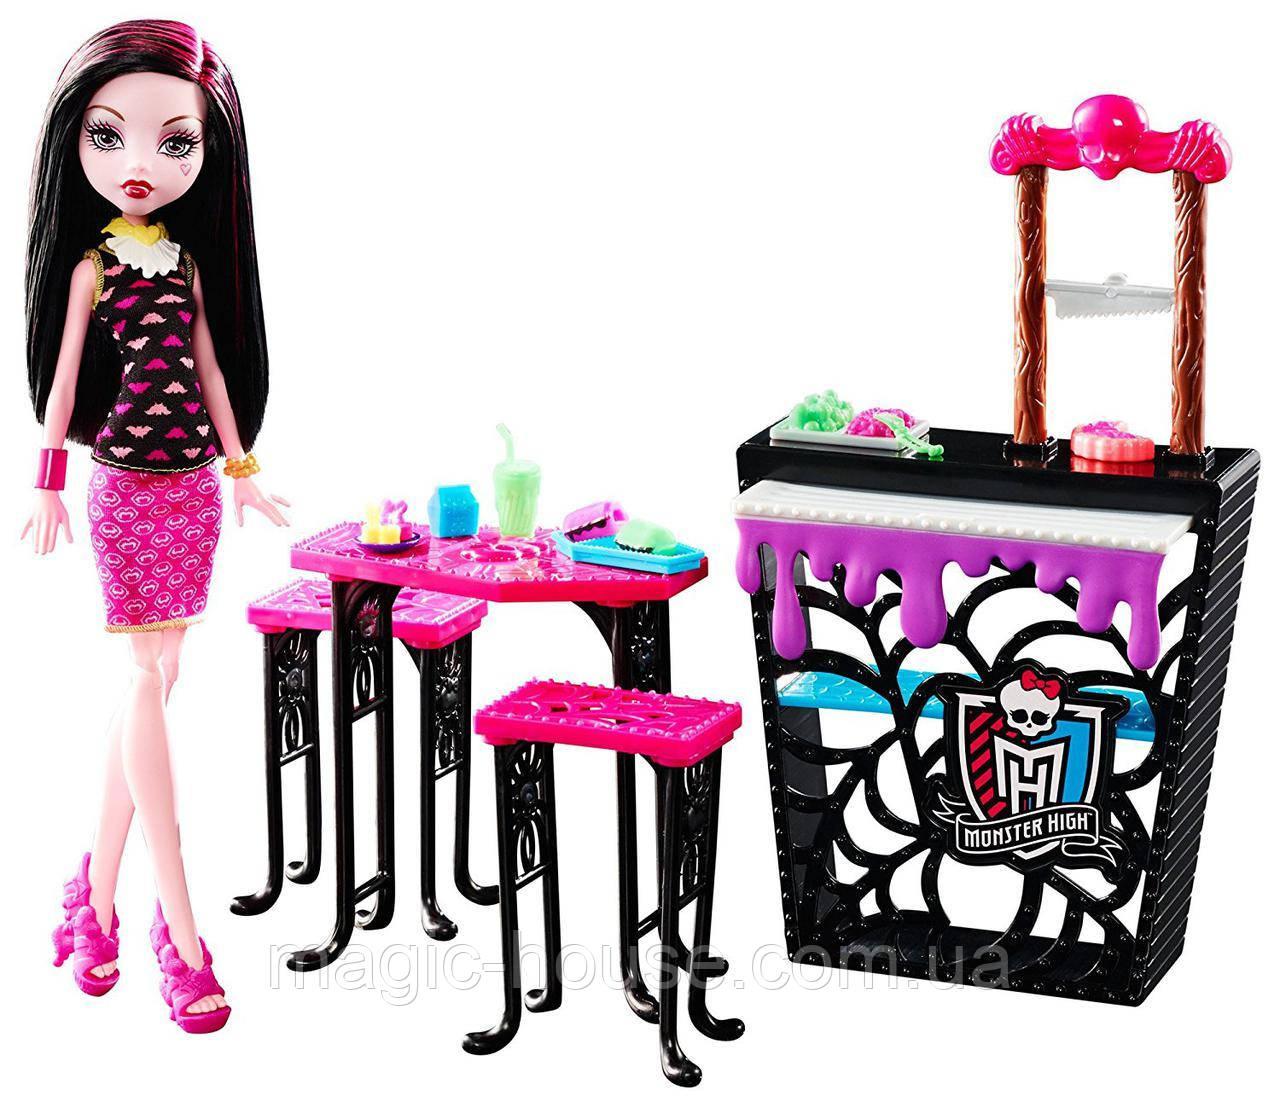 Игровой набор Дракулаура и Кафе Крипатерия  Monster High Beast Bites Cafe Draculaura Doll & Play